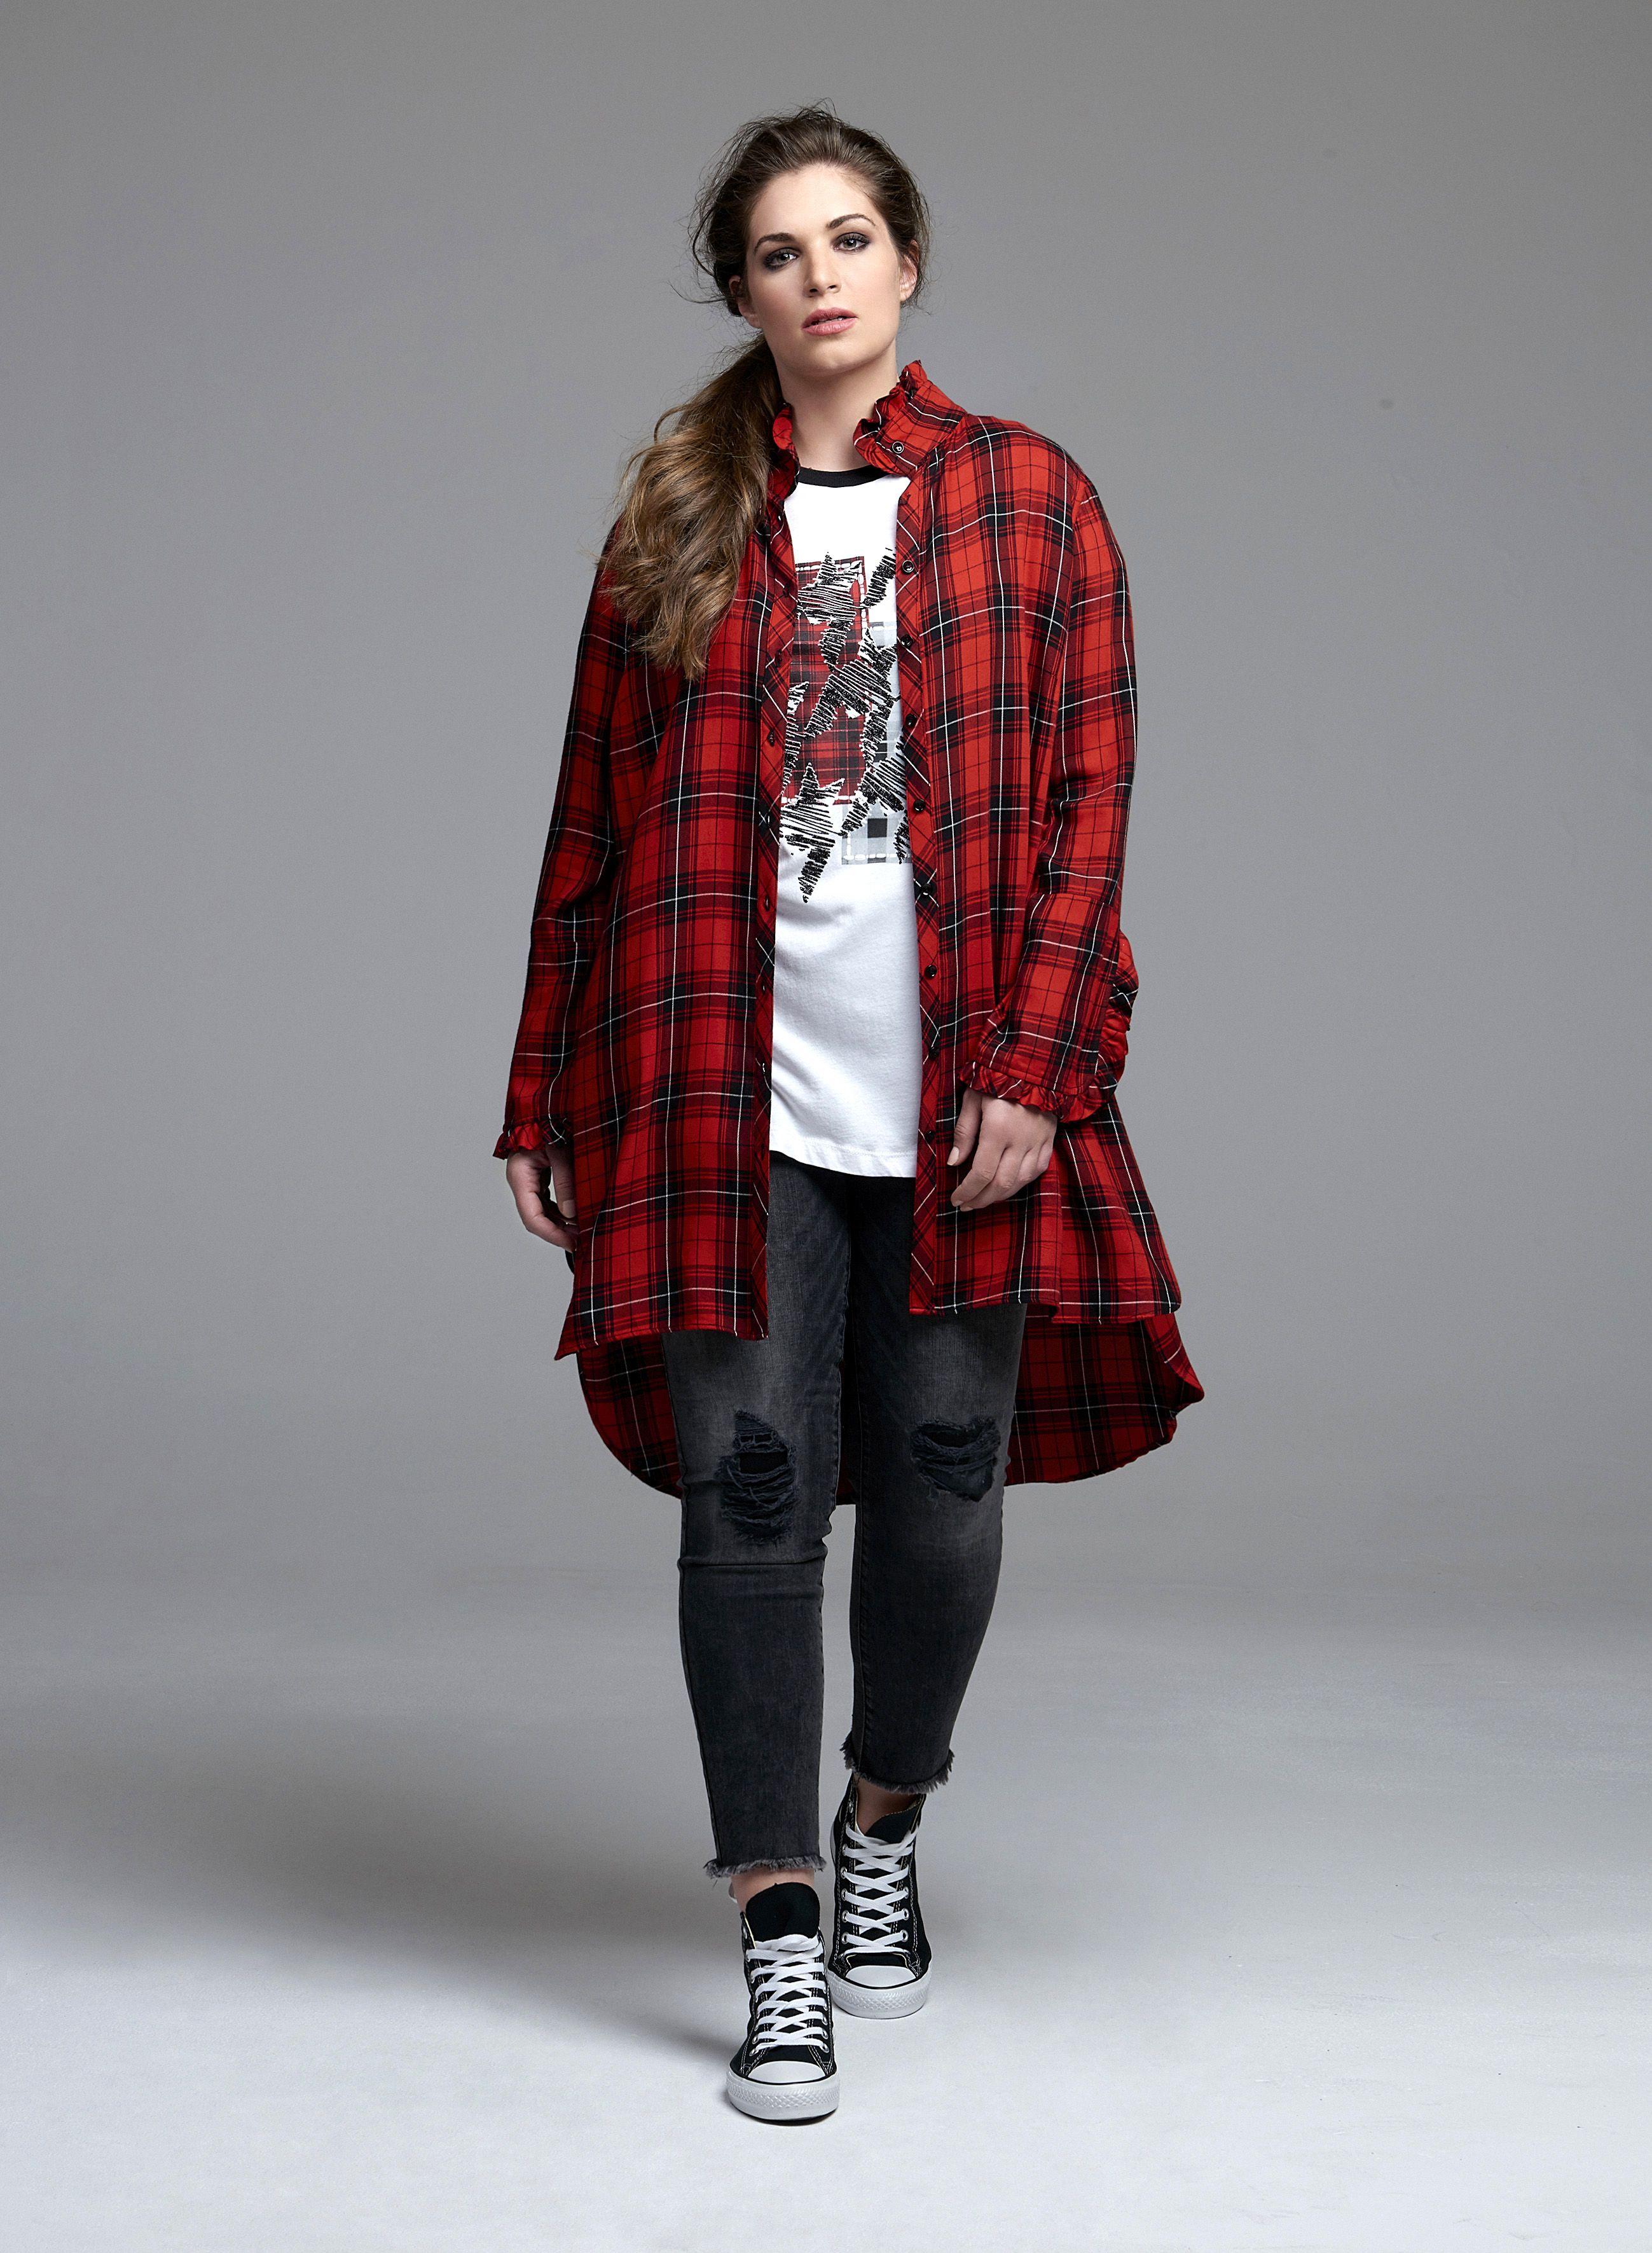 Checkmate    MAT FASHION F W 17-18  matfashion  fw1718  realsize  fashion   plussizefashion adbac5f25c2